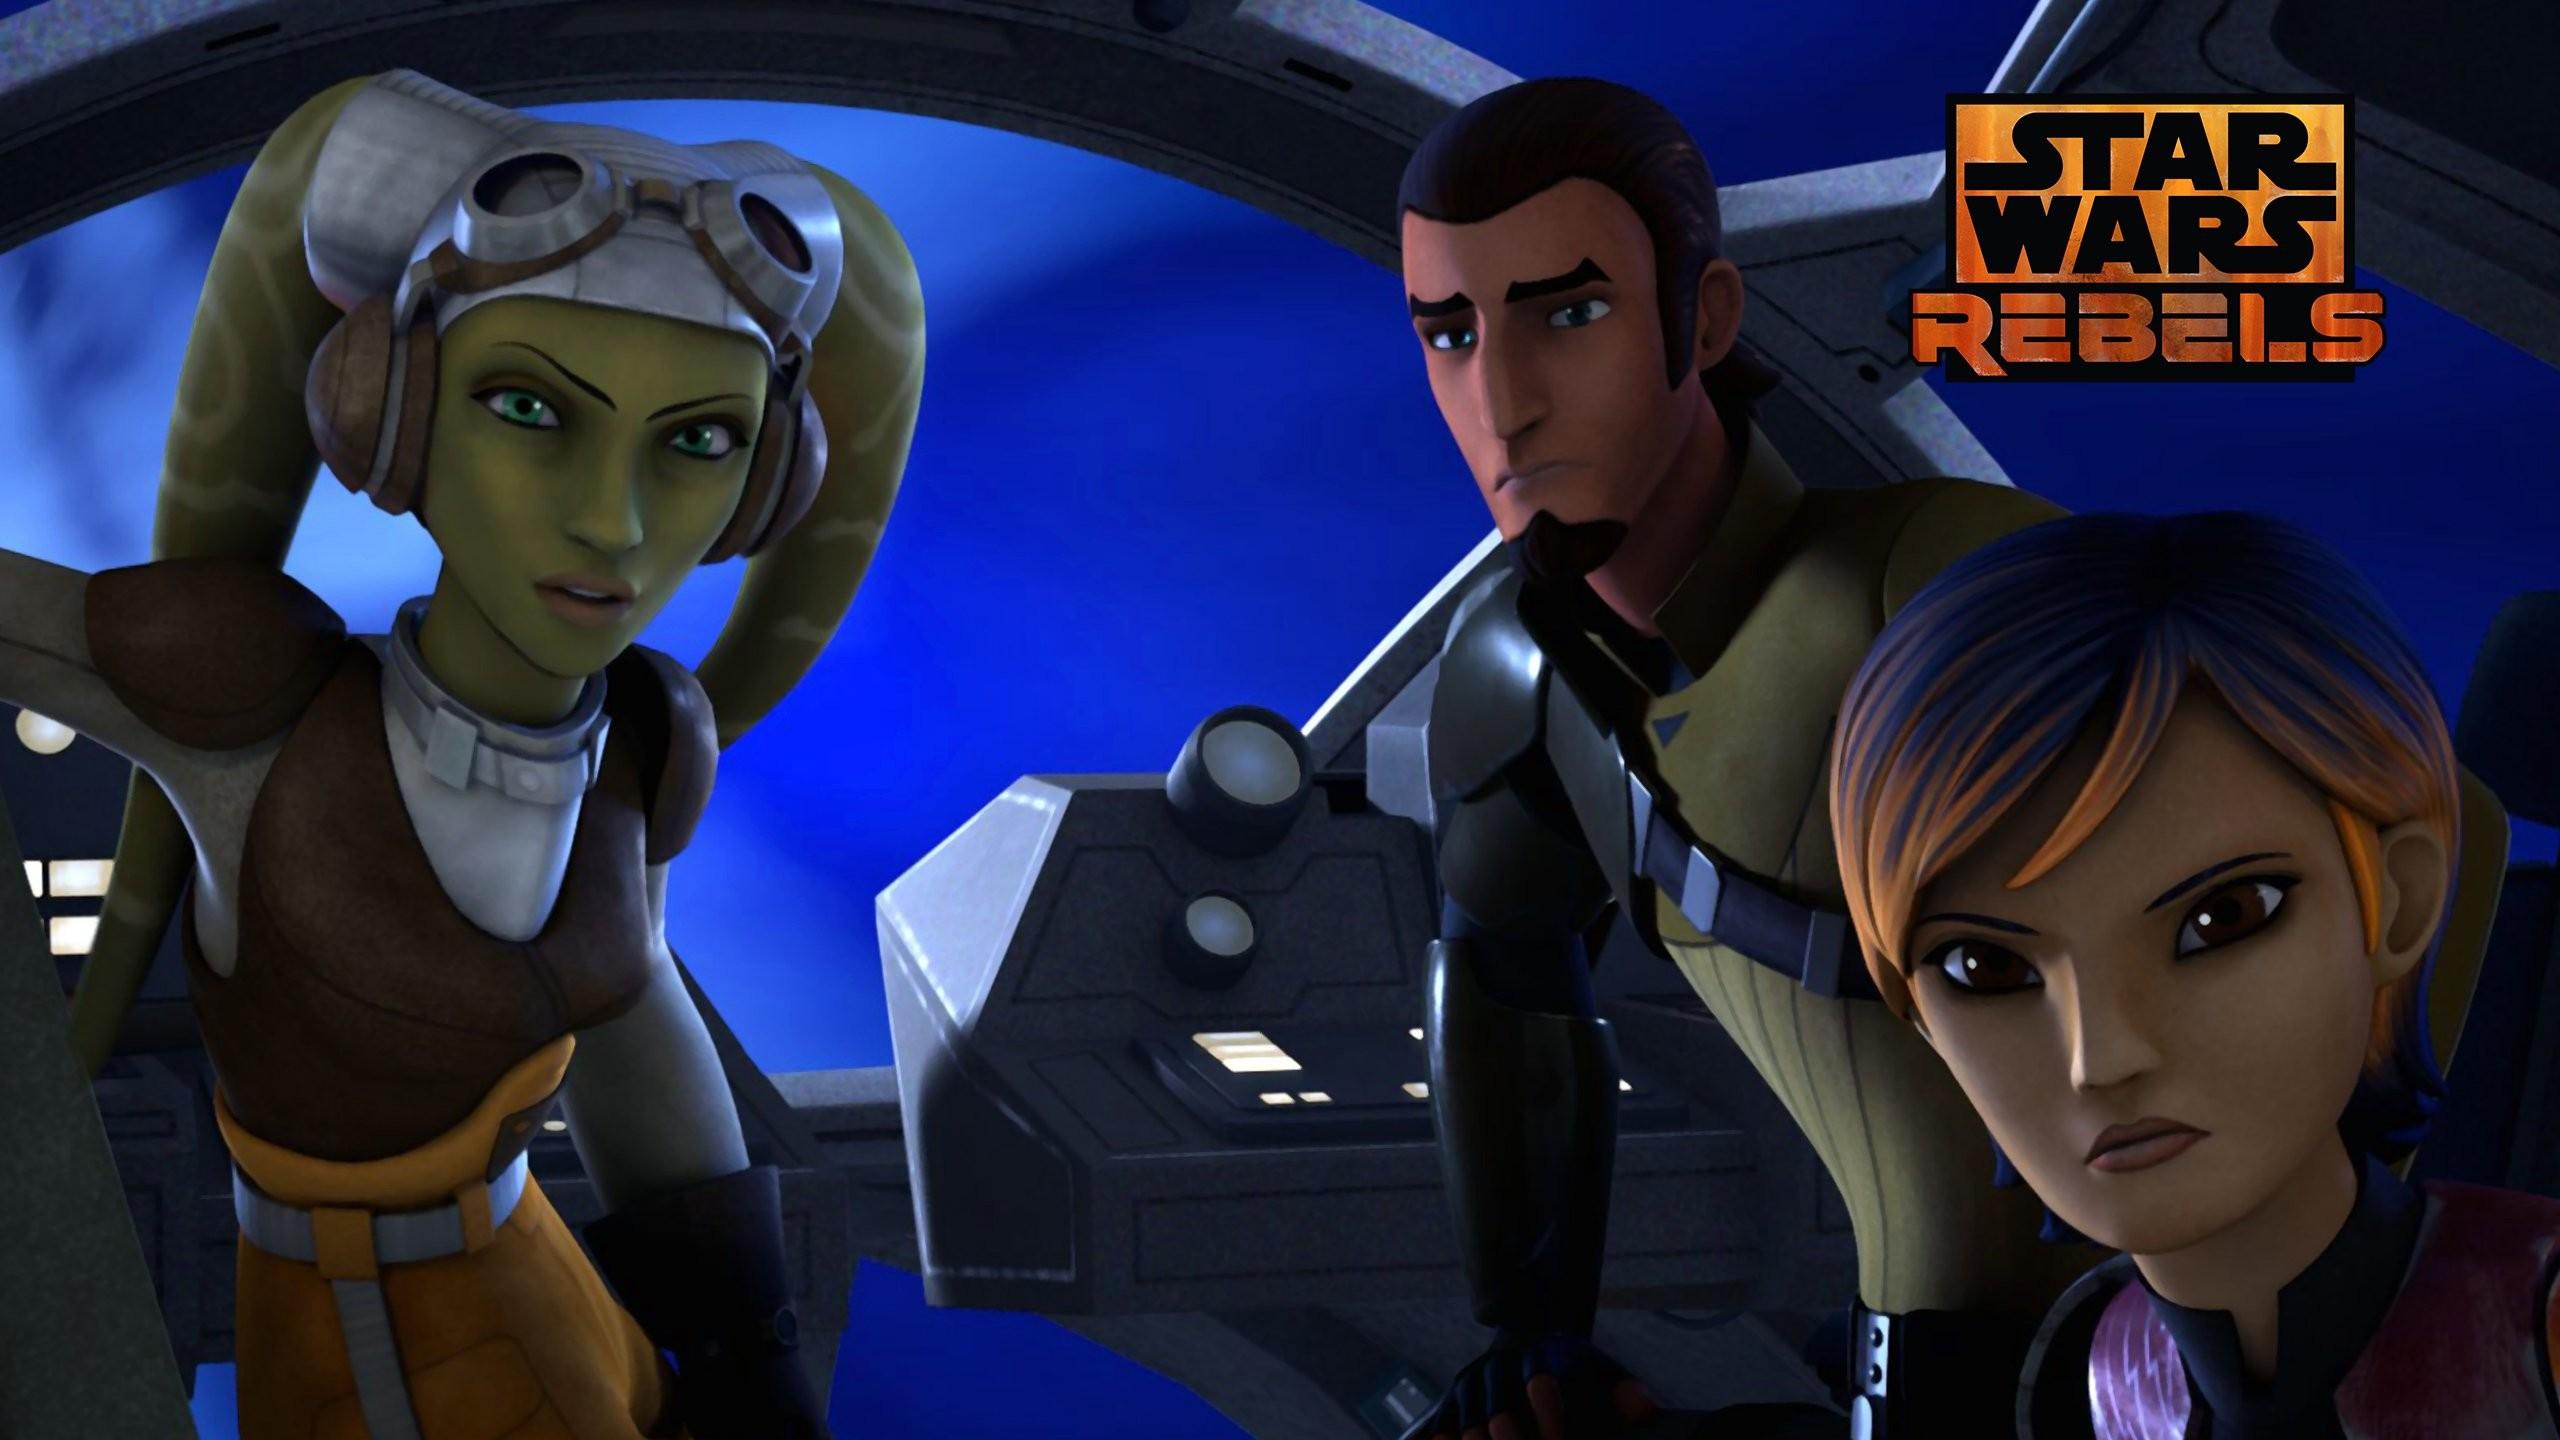 Sith Wallpaper Hd Star Wars Rebels Wallpapers 86 Images